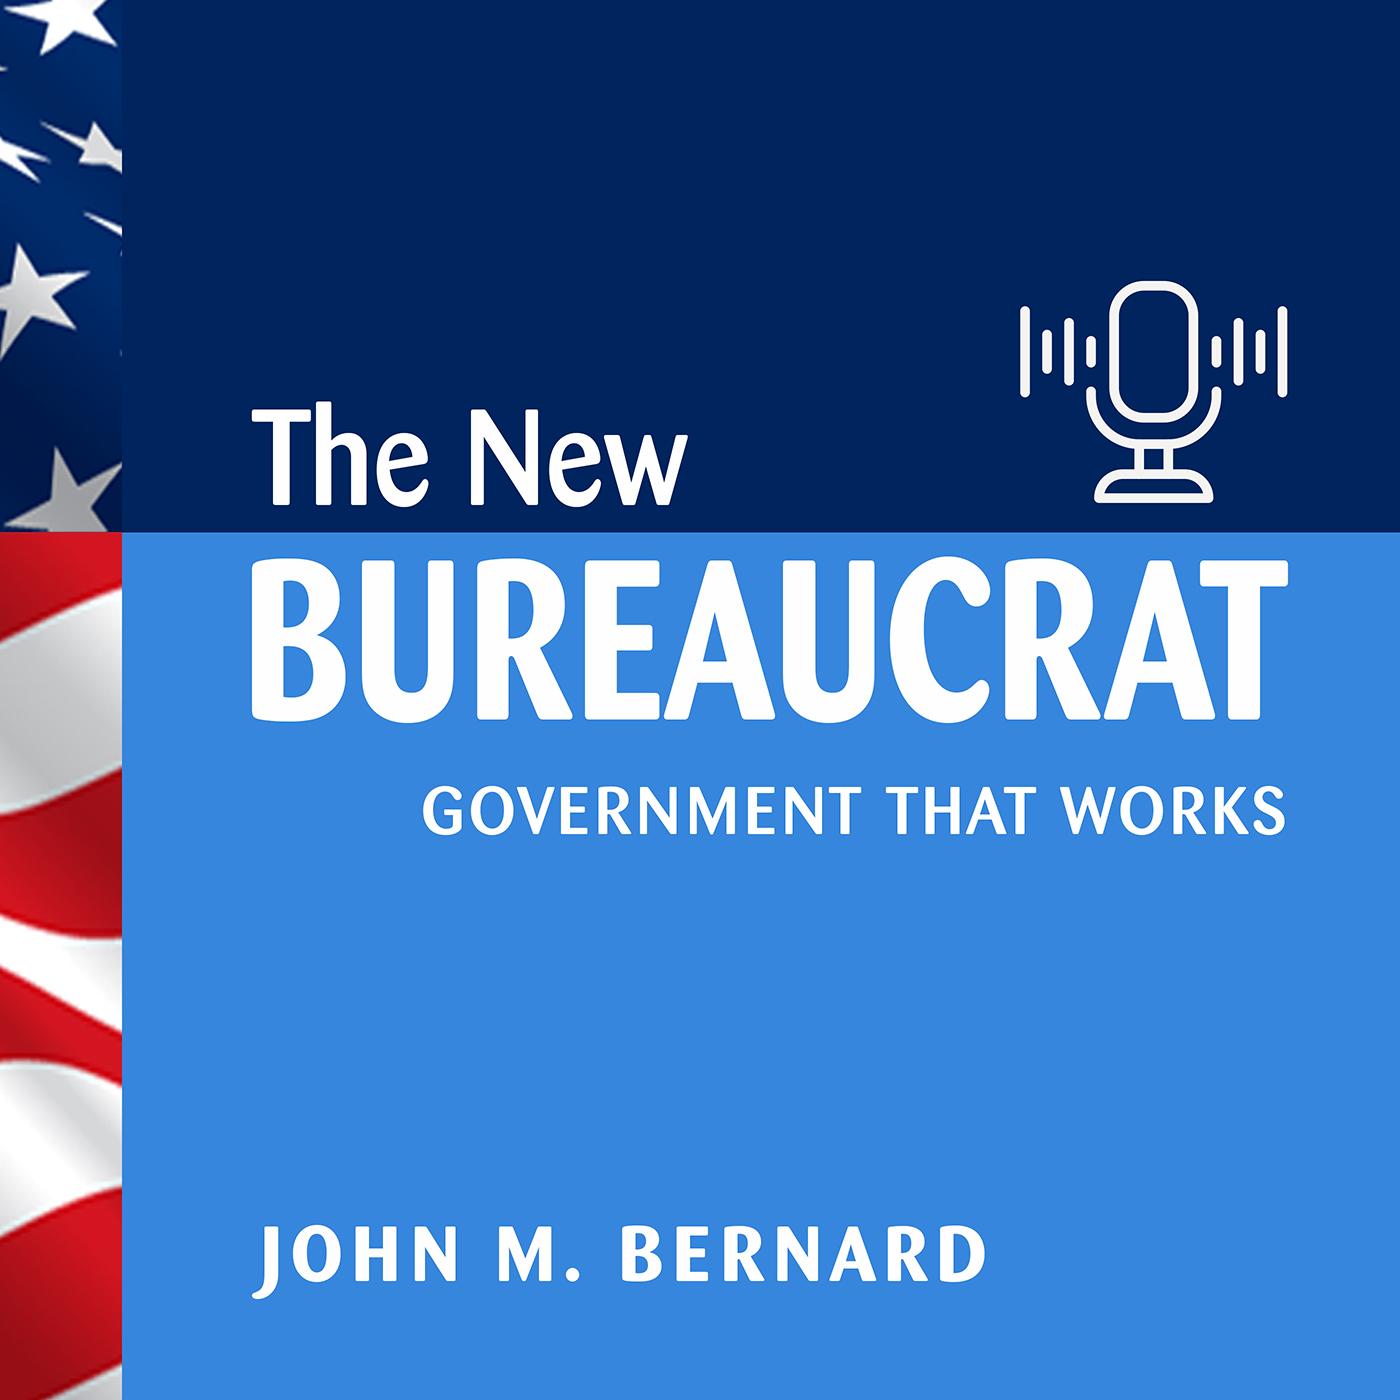 The New Bureaucrat, 1400x1400, S2, FINAL